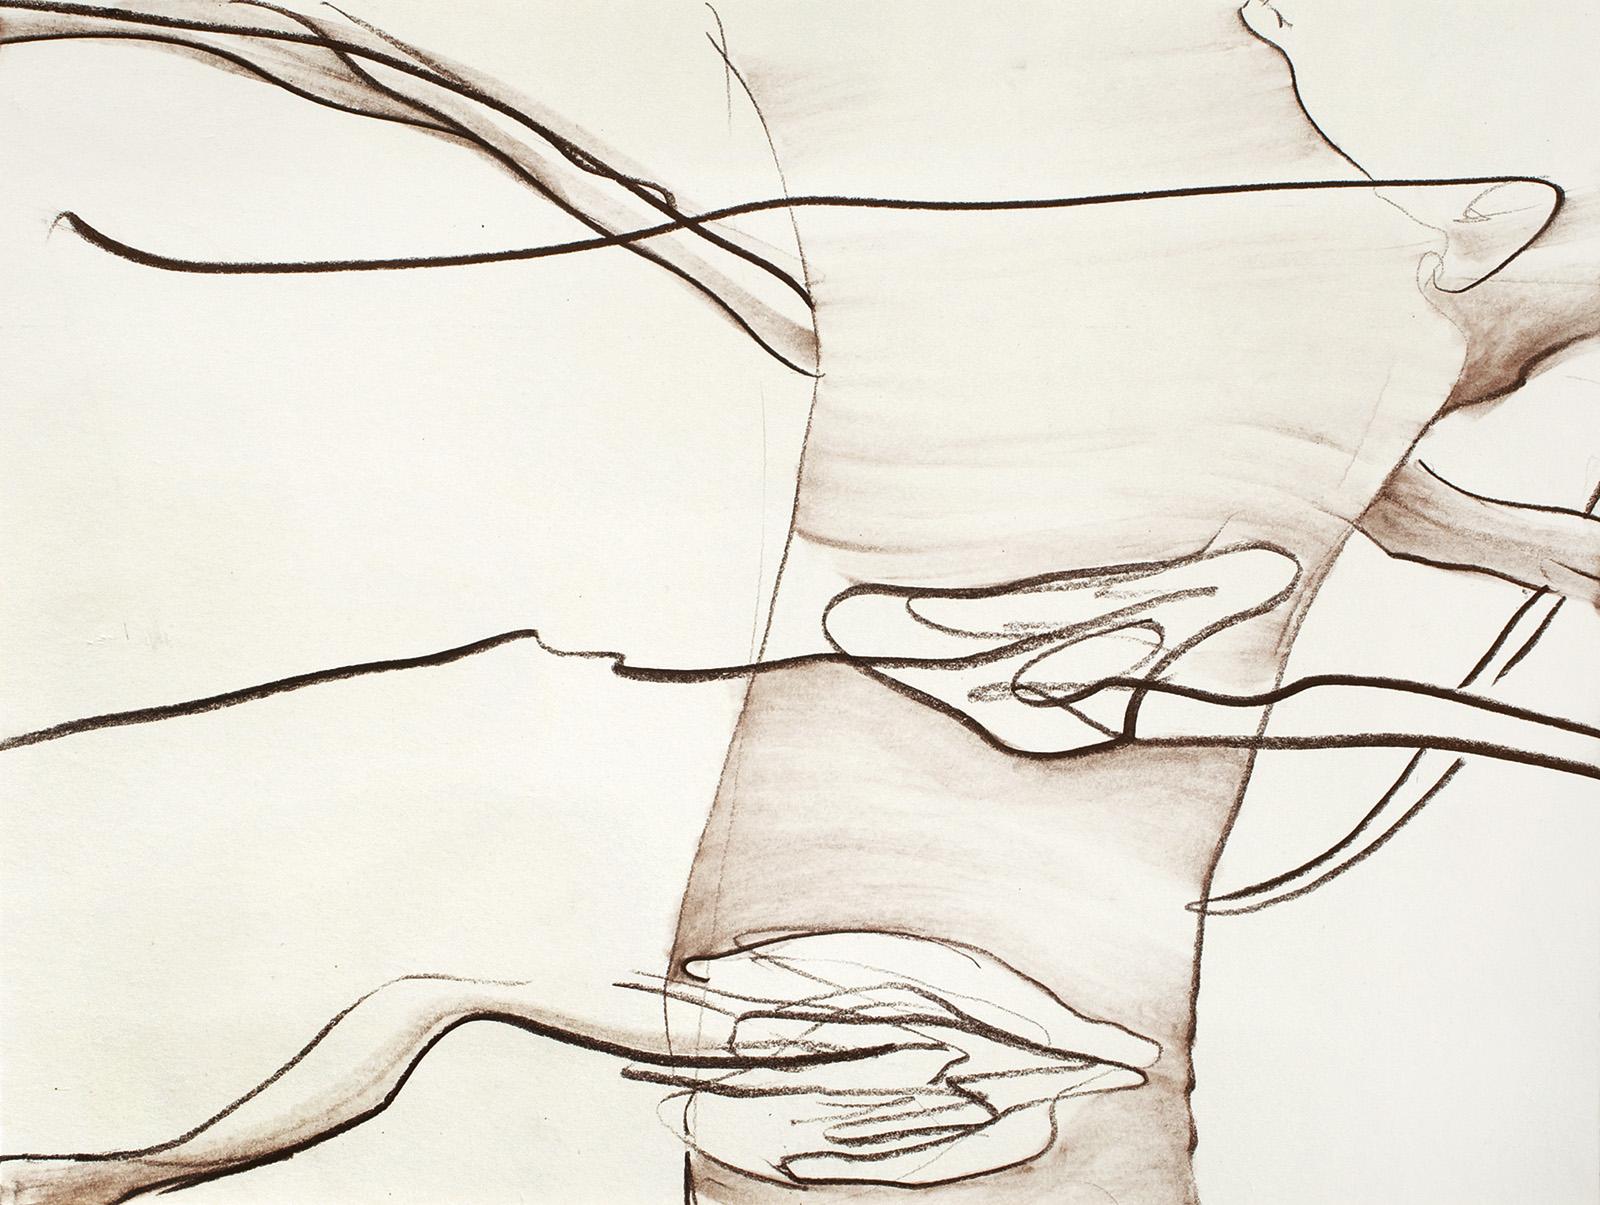 Schwarzenfels, Kreide auf Papier, 26 x 35 cm, 2013